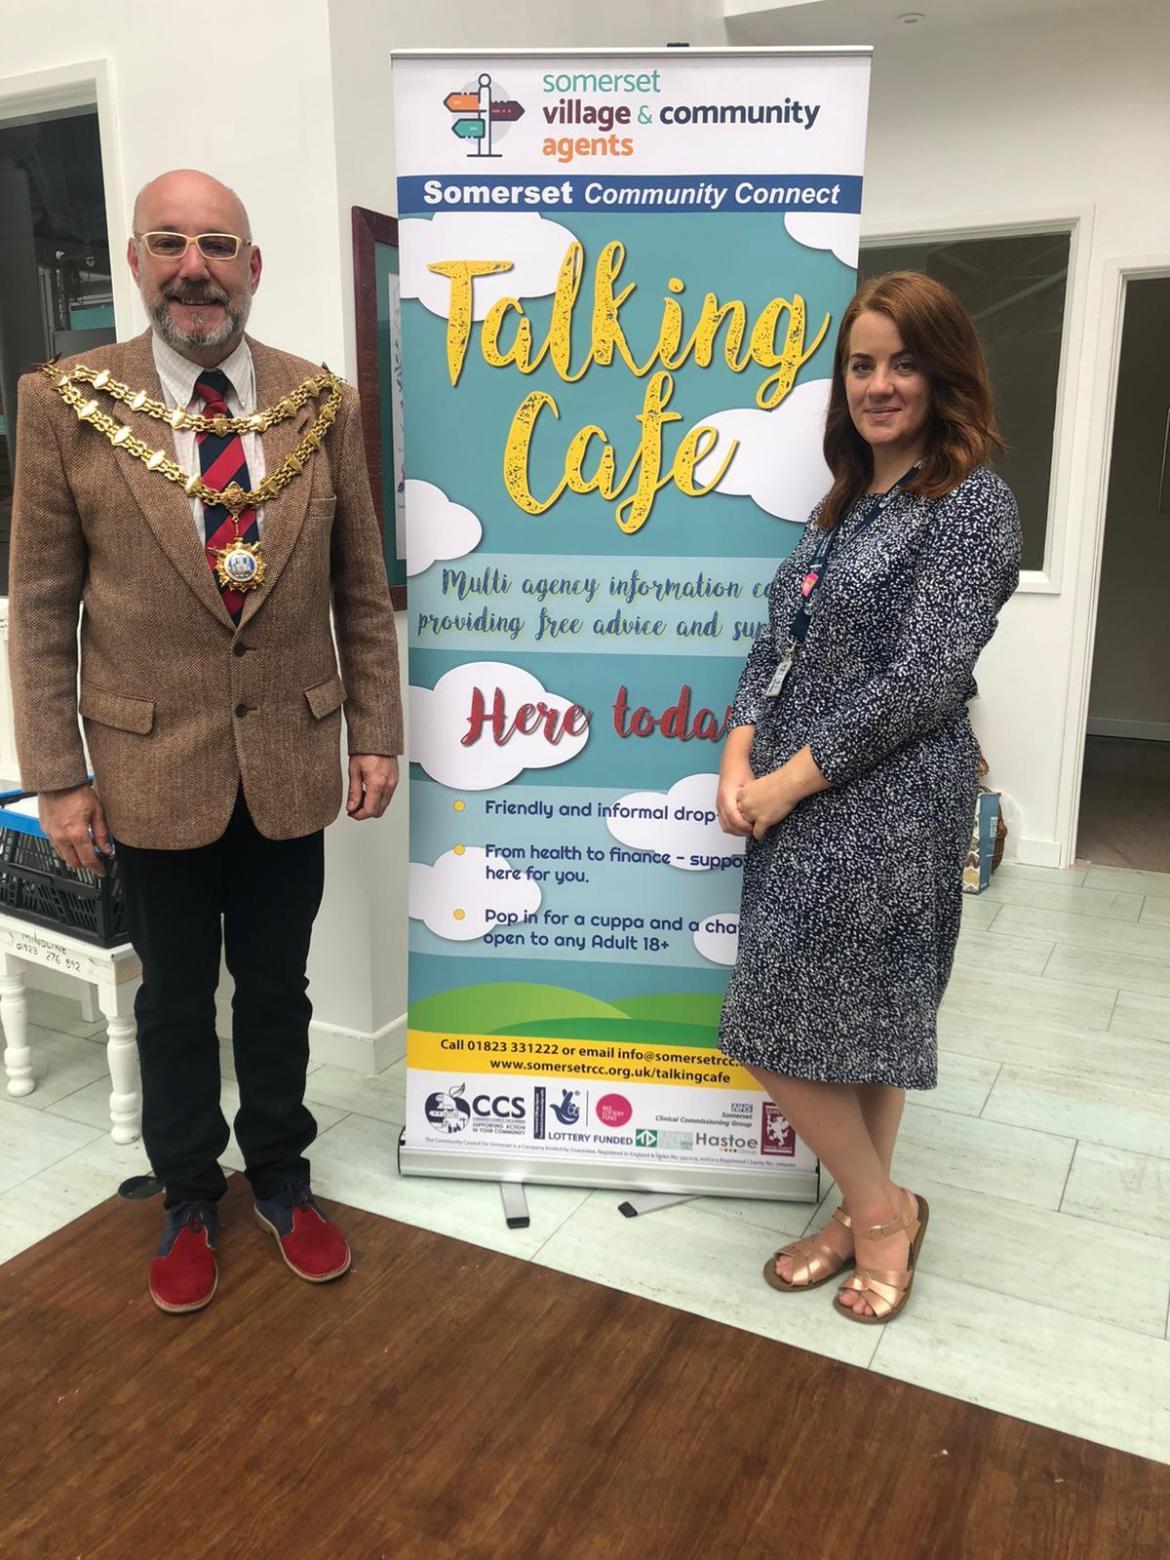 Bridgwater Mercury: TALKING CAFE OPENS: Mayor Leigh Redman with Lauren Giddins, the team leader for Sedgemoor Village agents